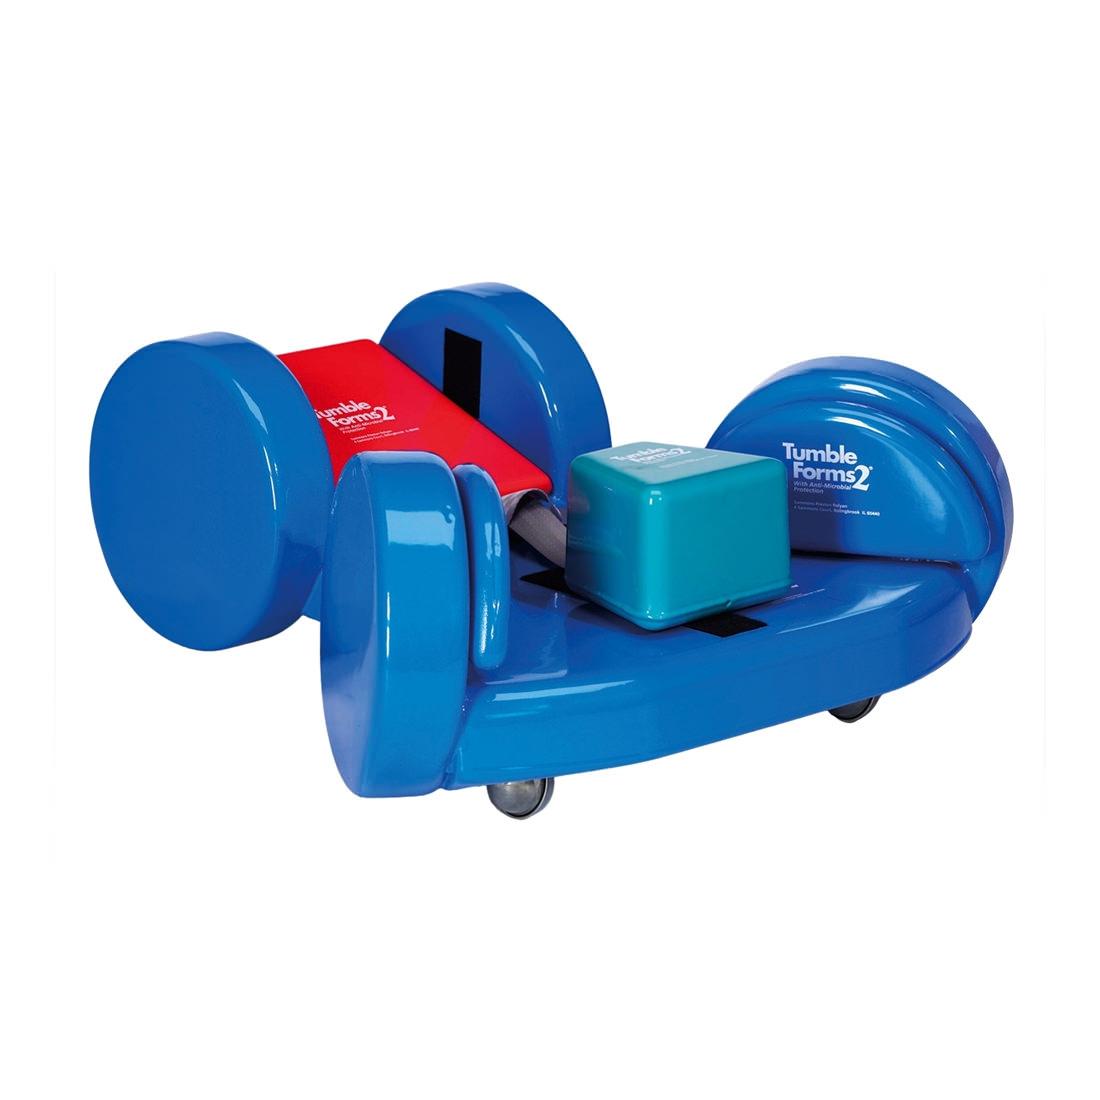 Tumble Forms Jettmobile